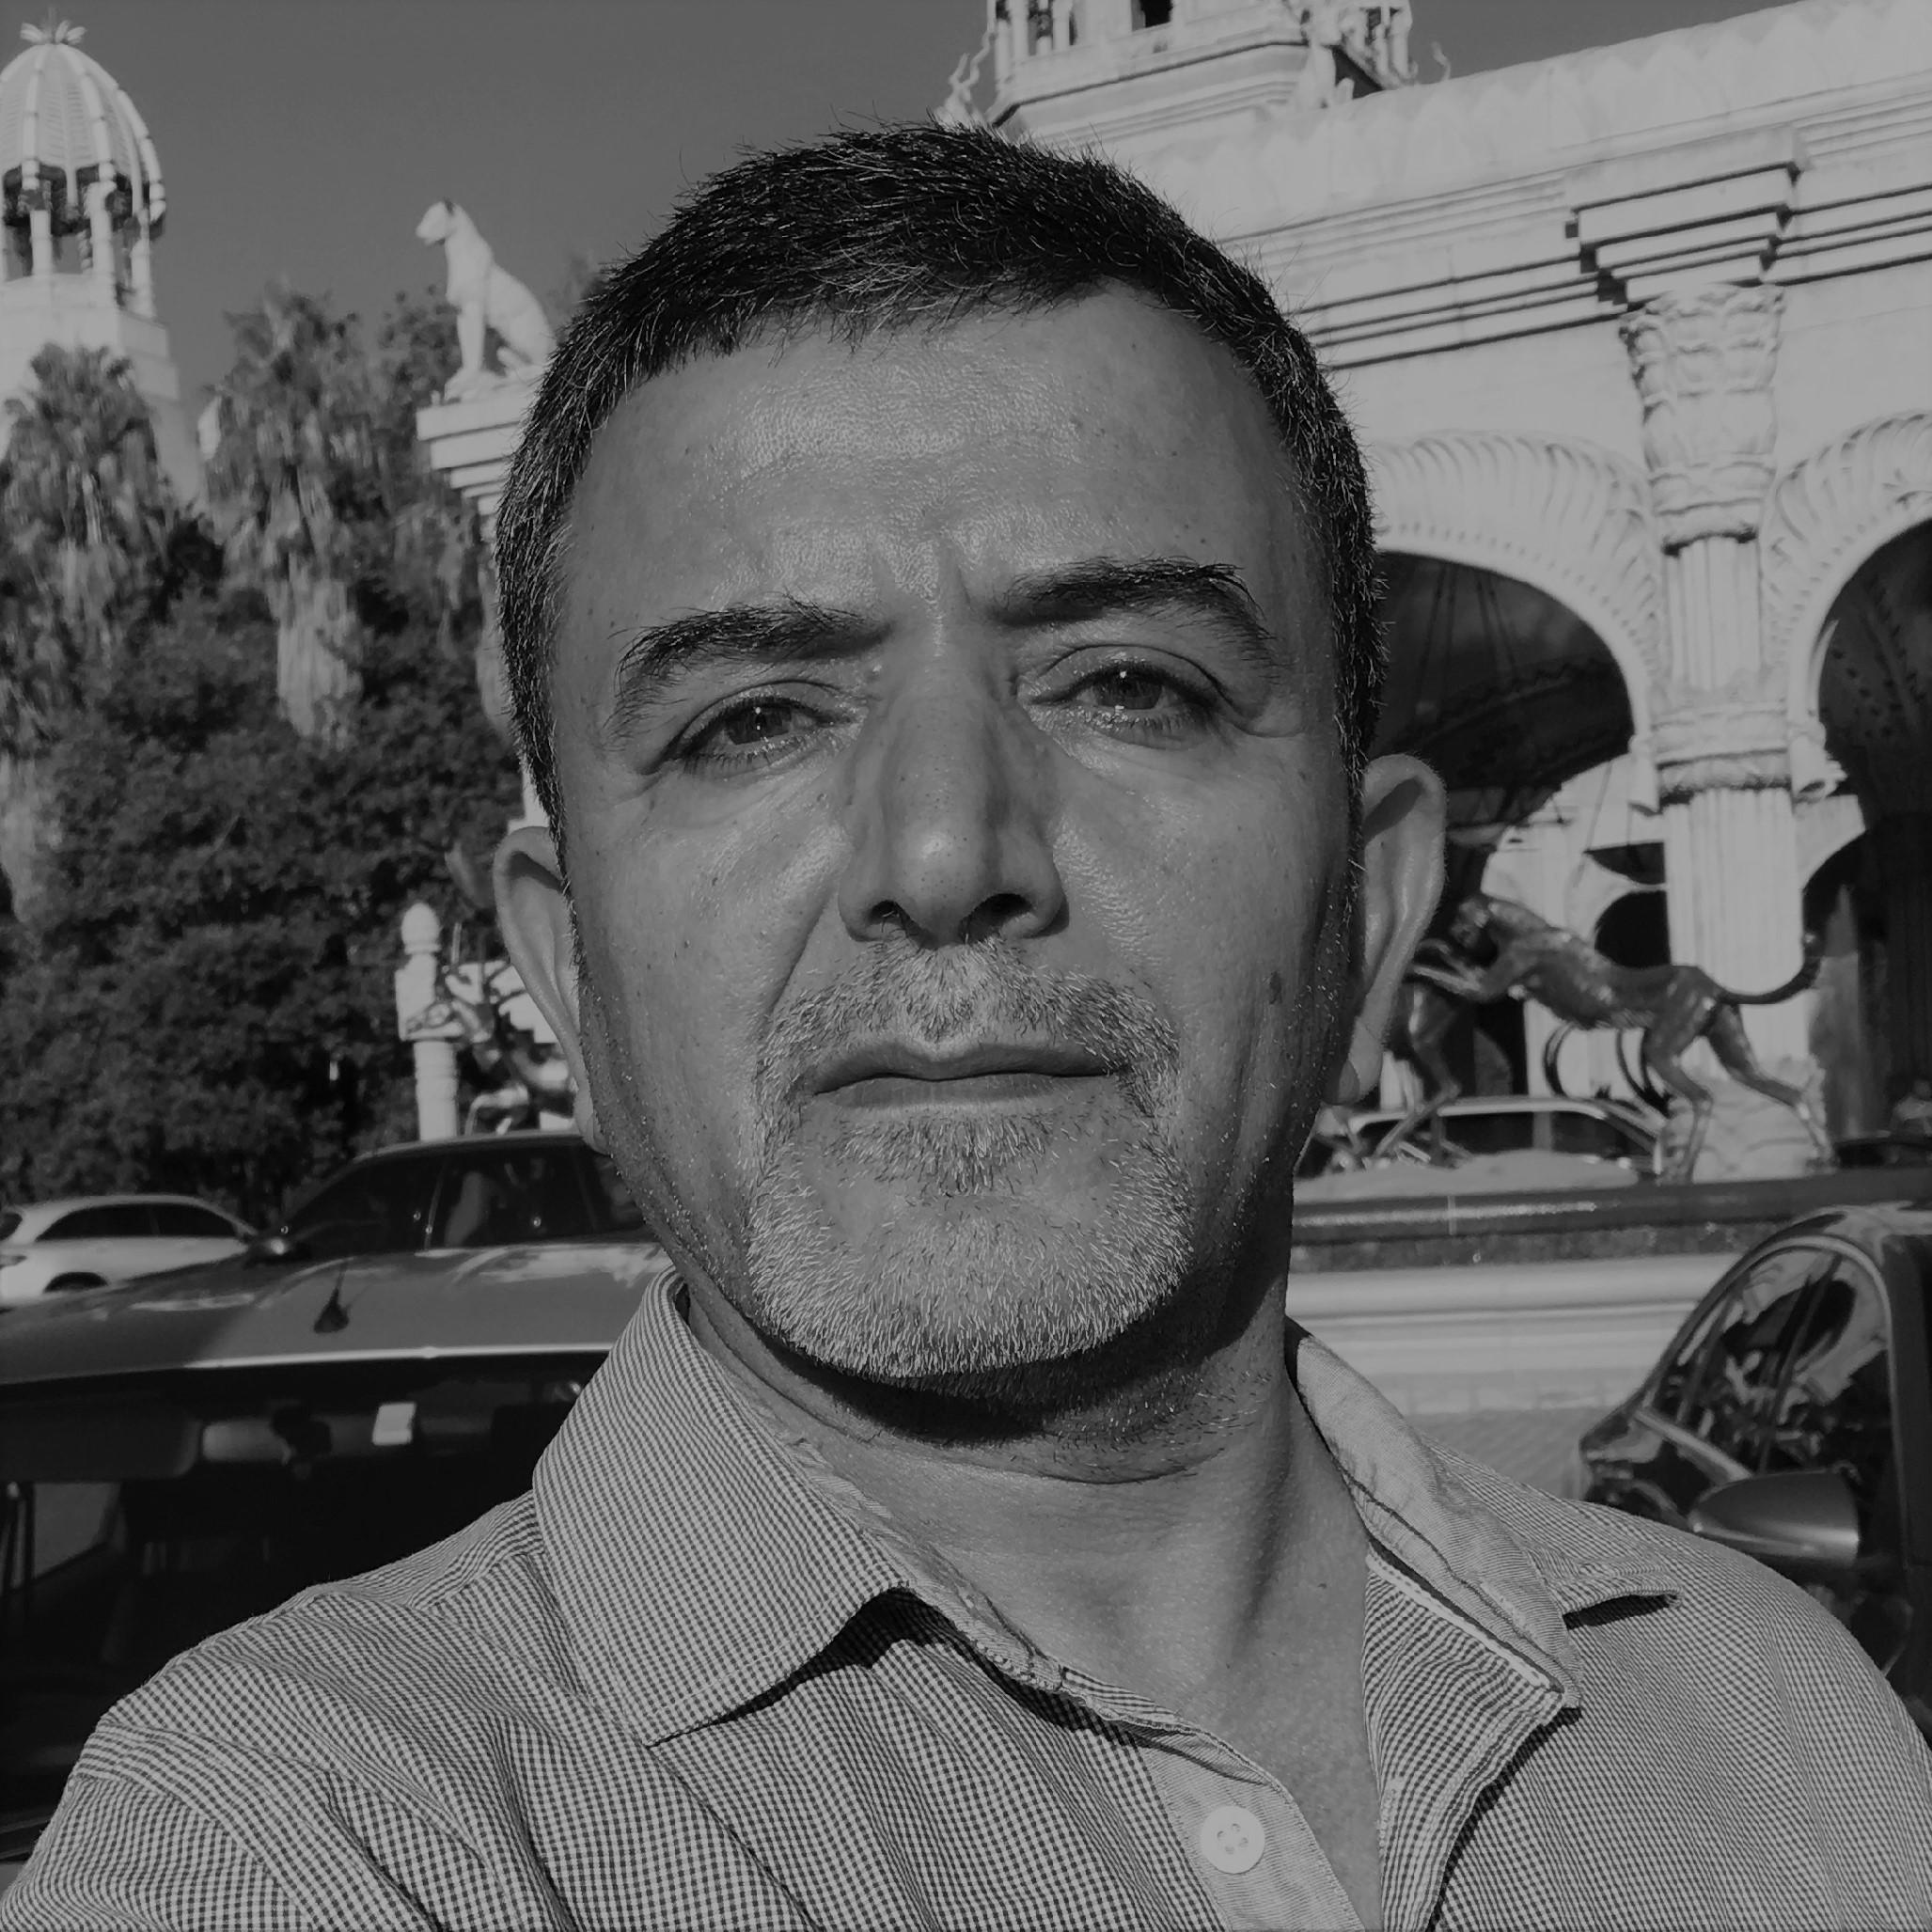 Dr Emad Uheida